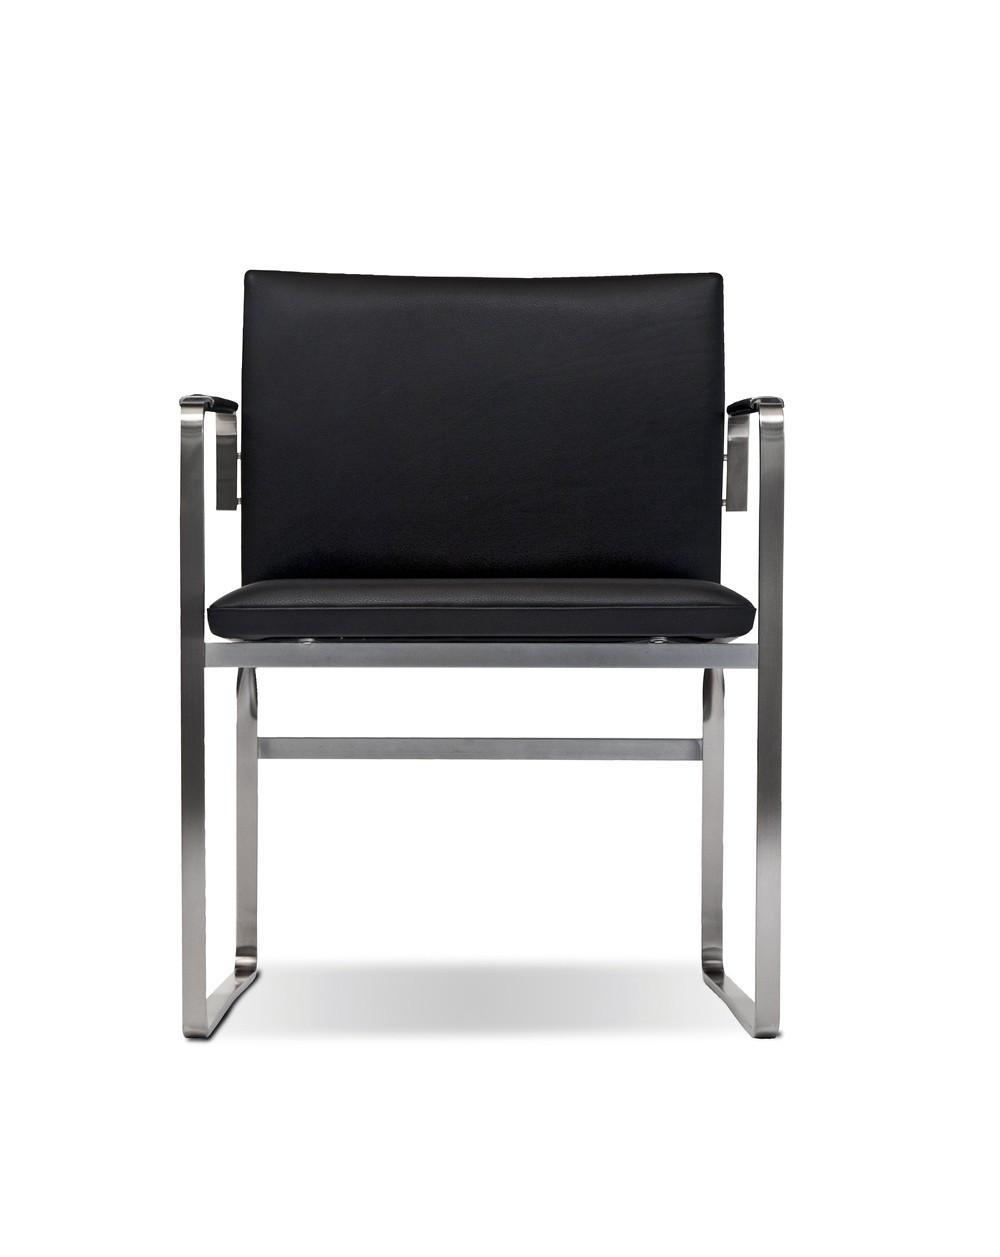 Chaise Arcadia CH11, design Hans J. Wegner